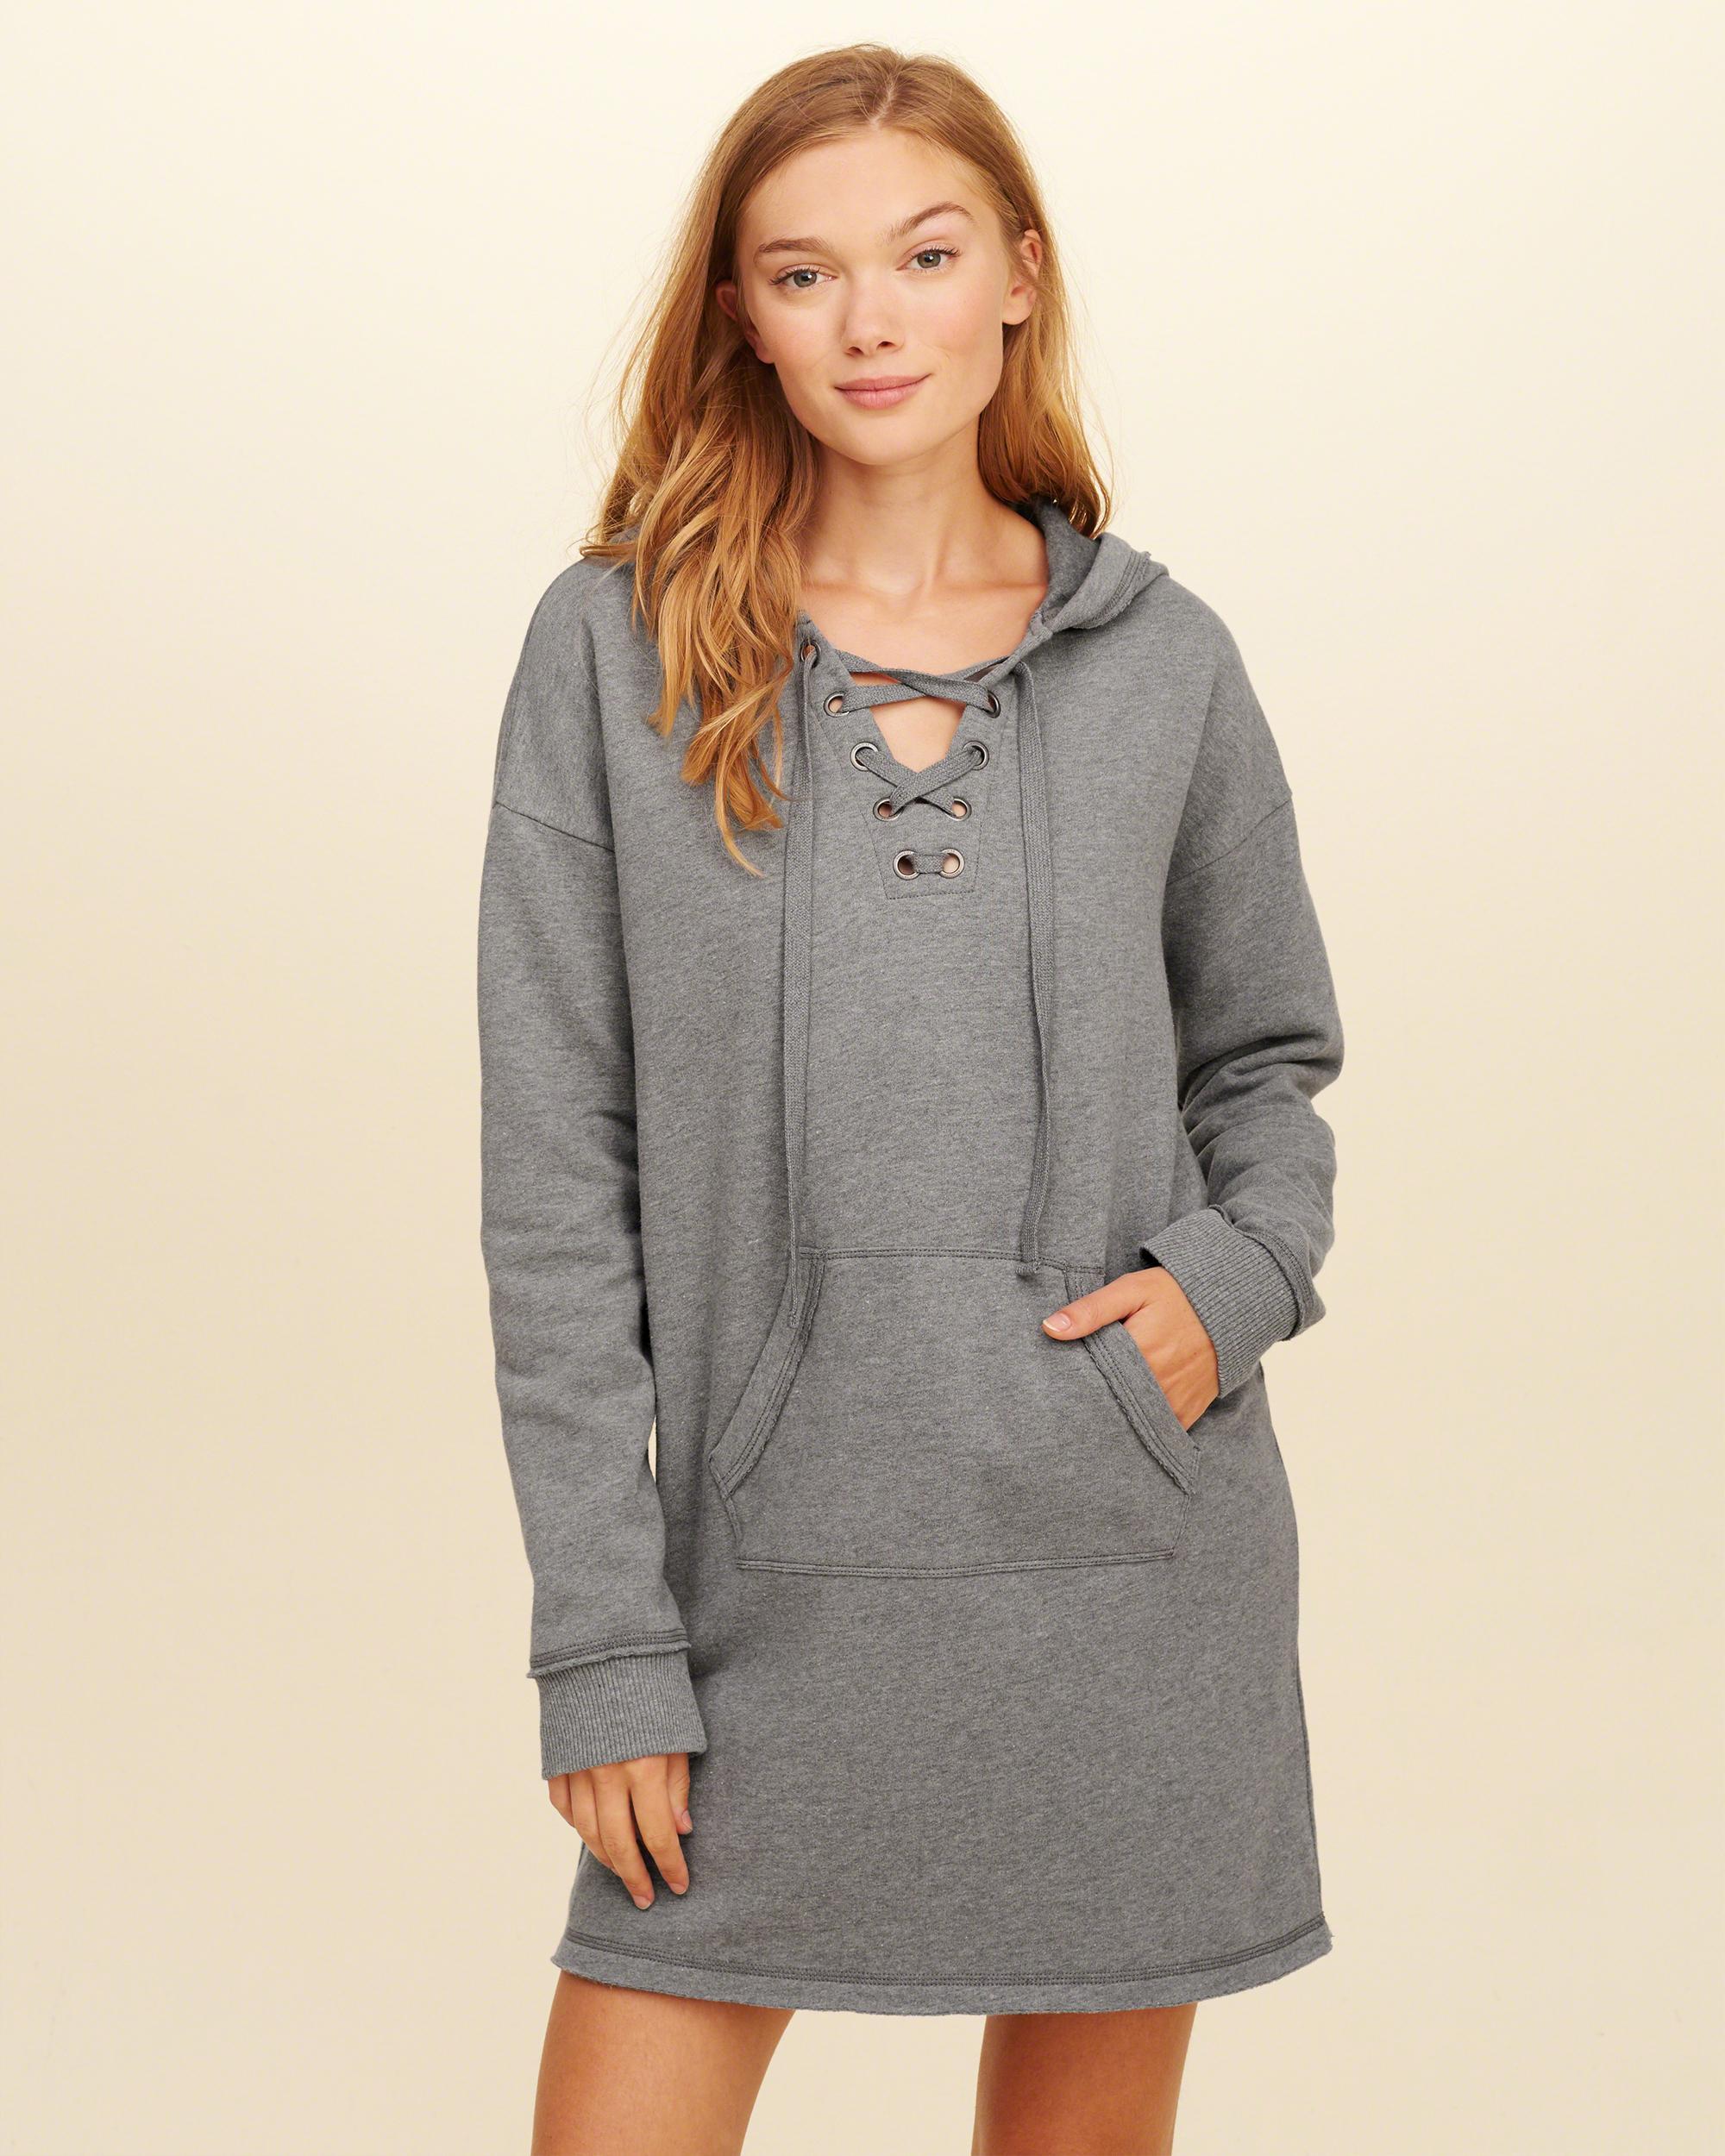 Hooded Sweatshirt Dress with Embroidery - Grey Hollister jpnv4